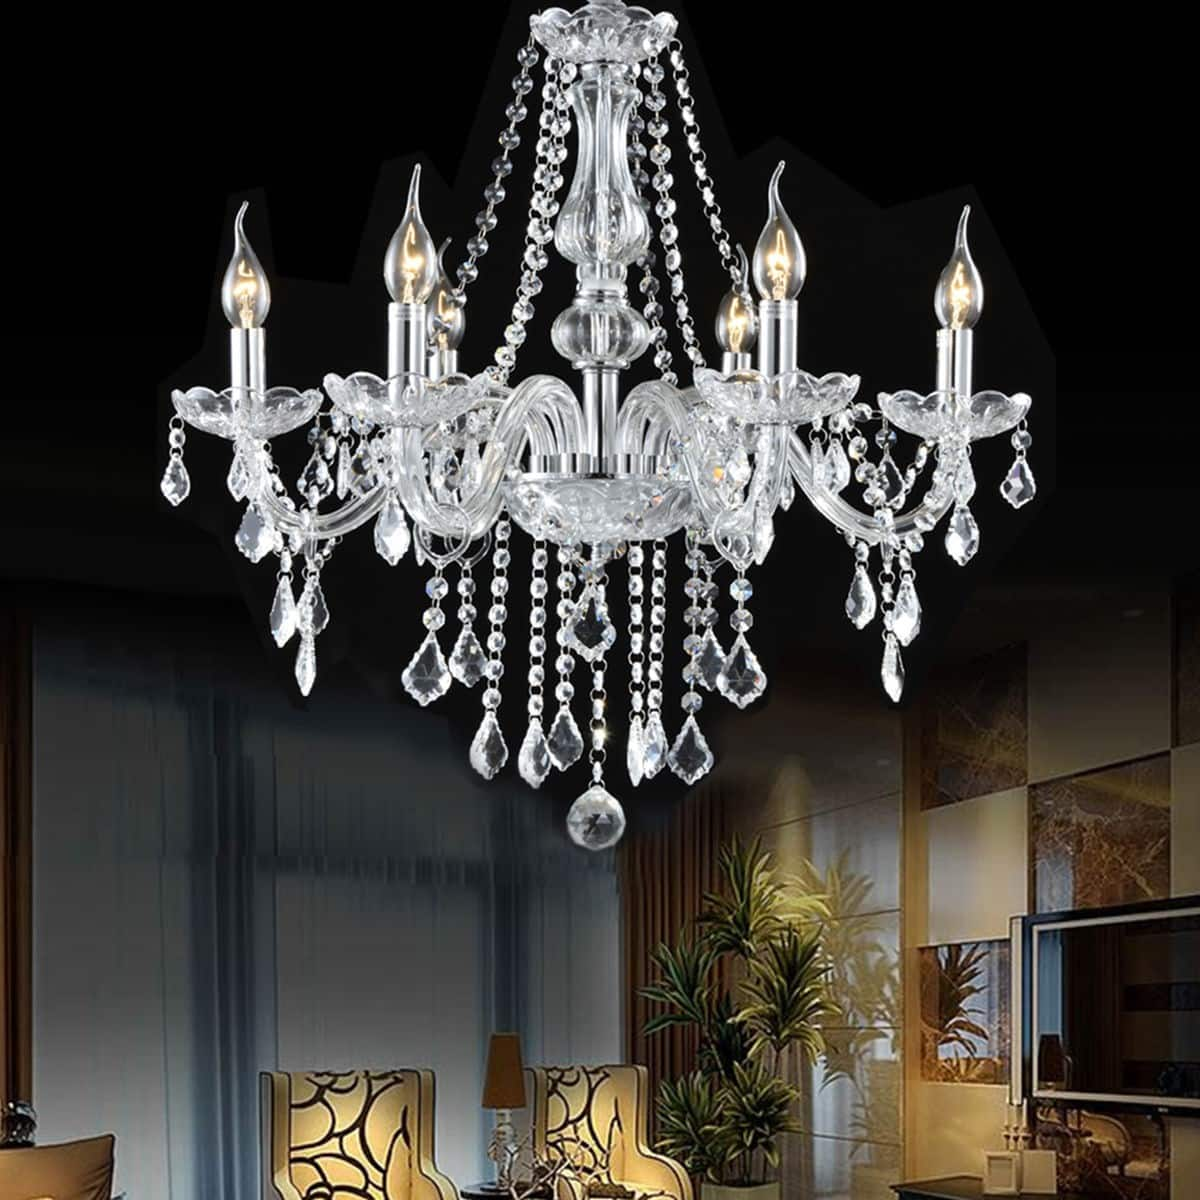 Costway Elegant Crystal Chandelier Ceiling Light - $63.95 + Free Shipping